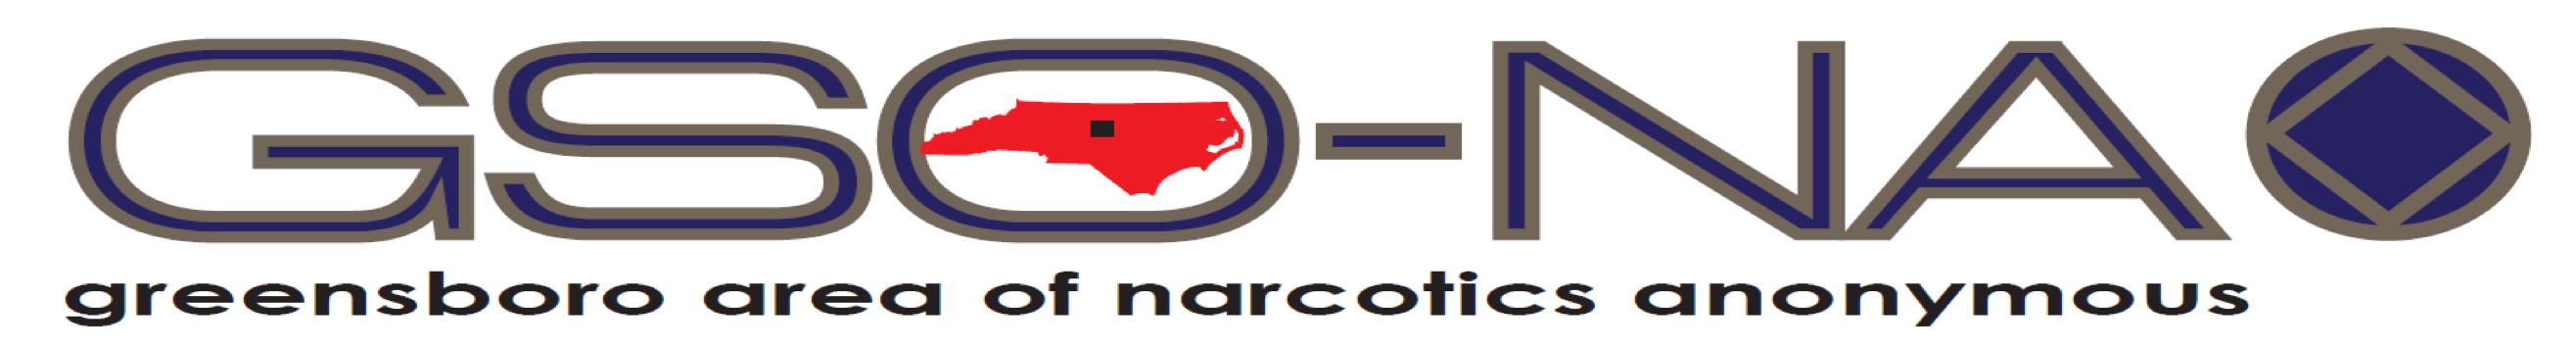 Greensboro Area of Narcotics Anonymous